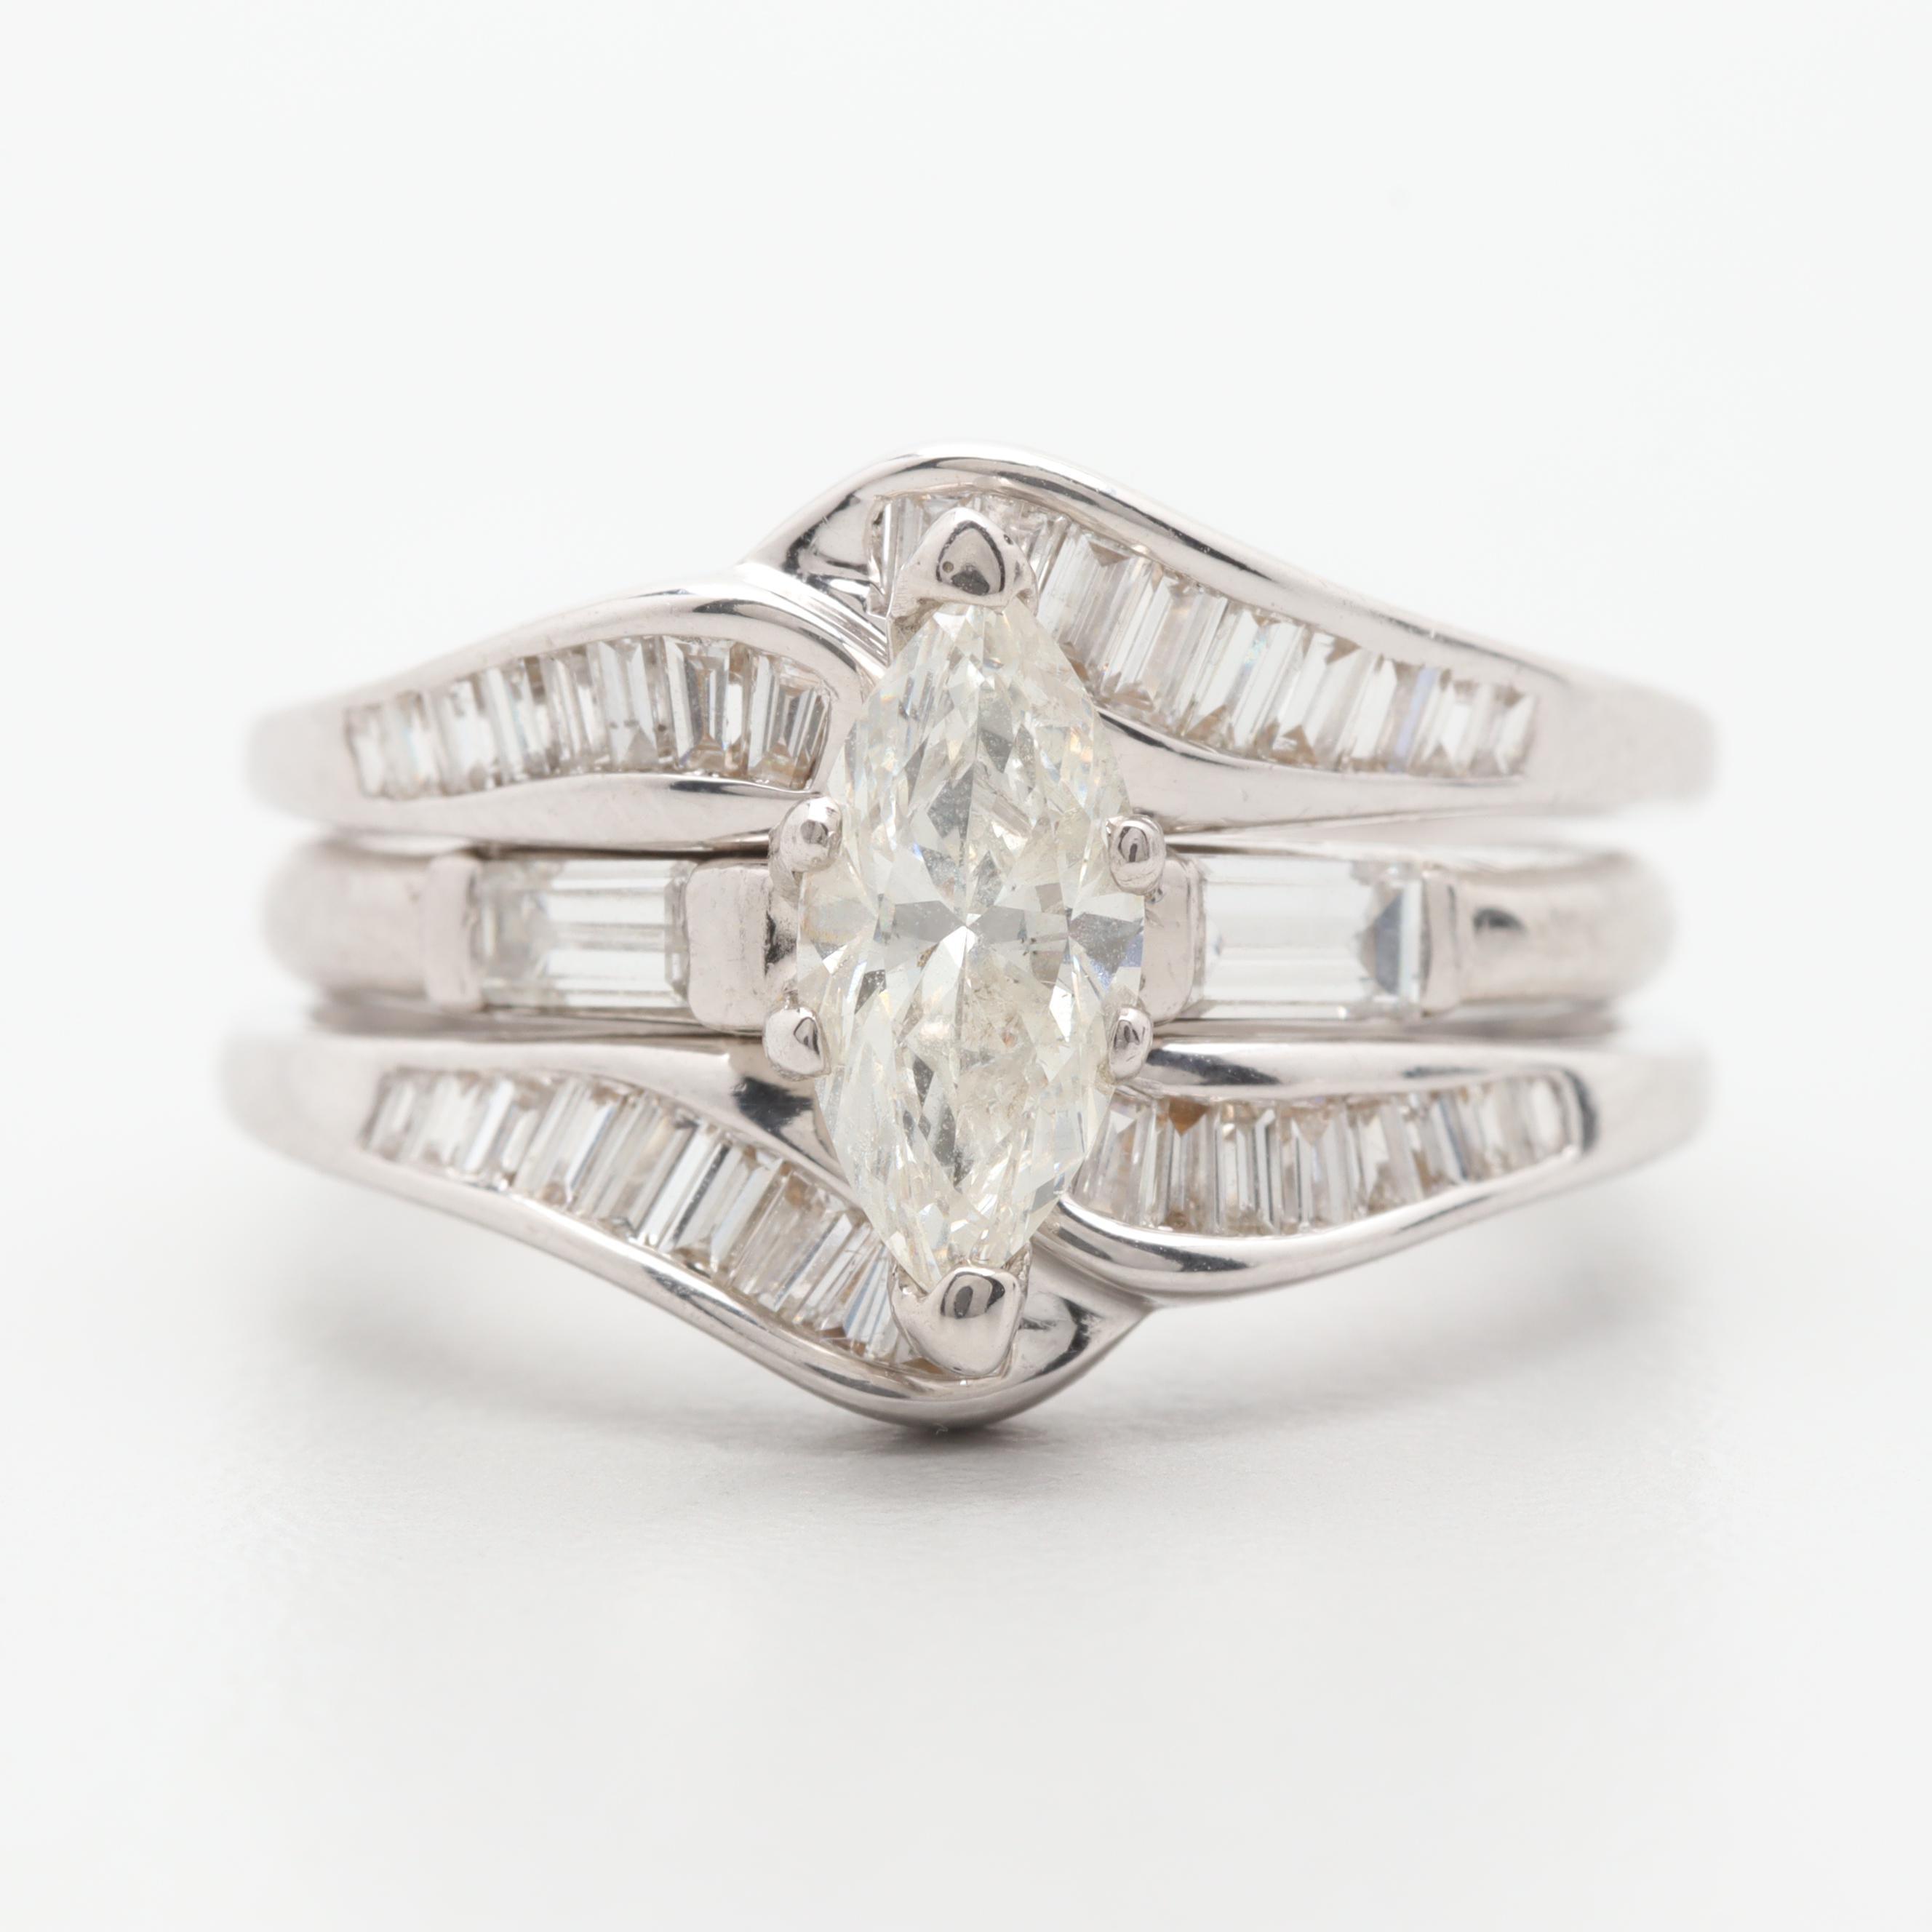 Platinum and 14K White Gold 1.83 CTW Diamond Wedding Ring Set